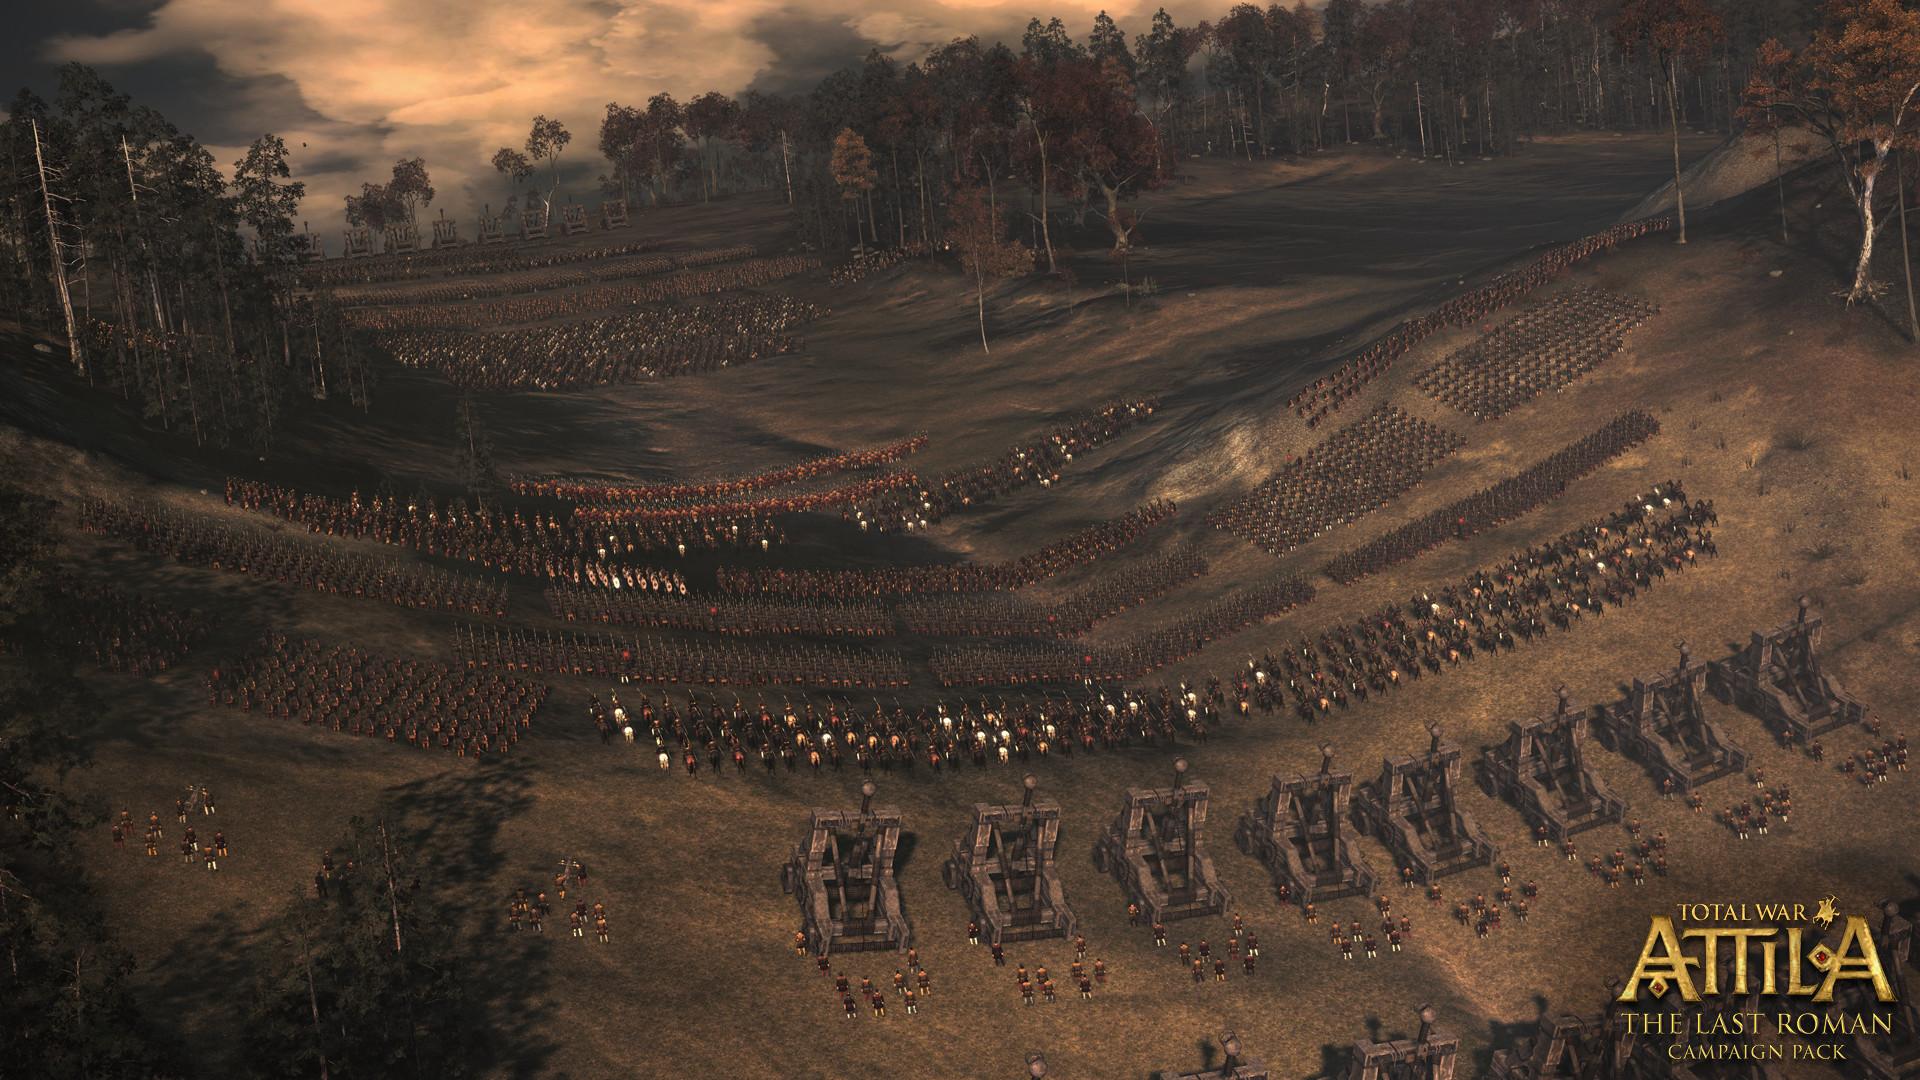 Total War: ATTILA - The Last Roman Campaign Pack PC Fiyatları